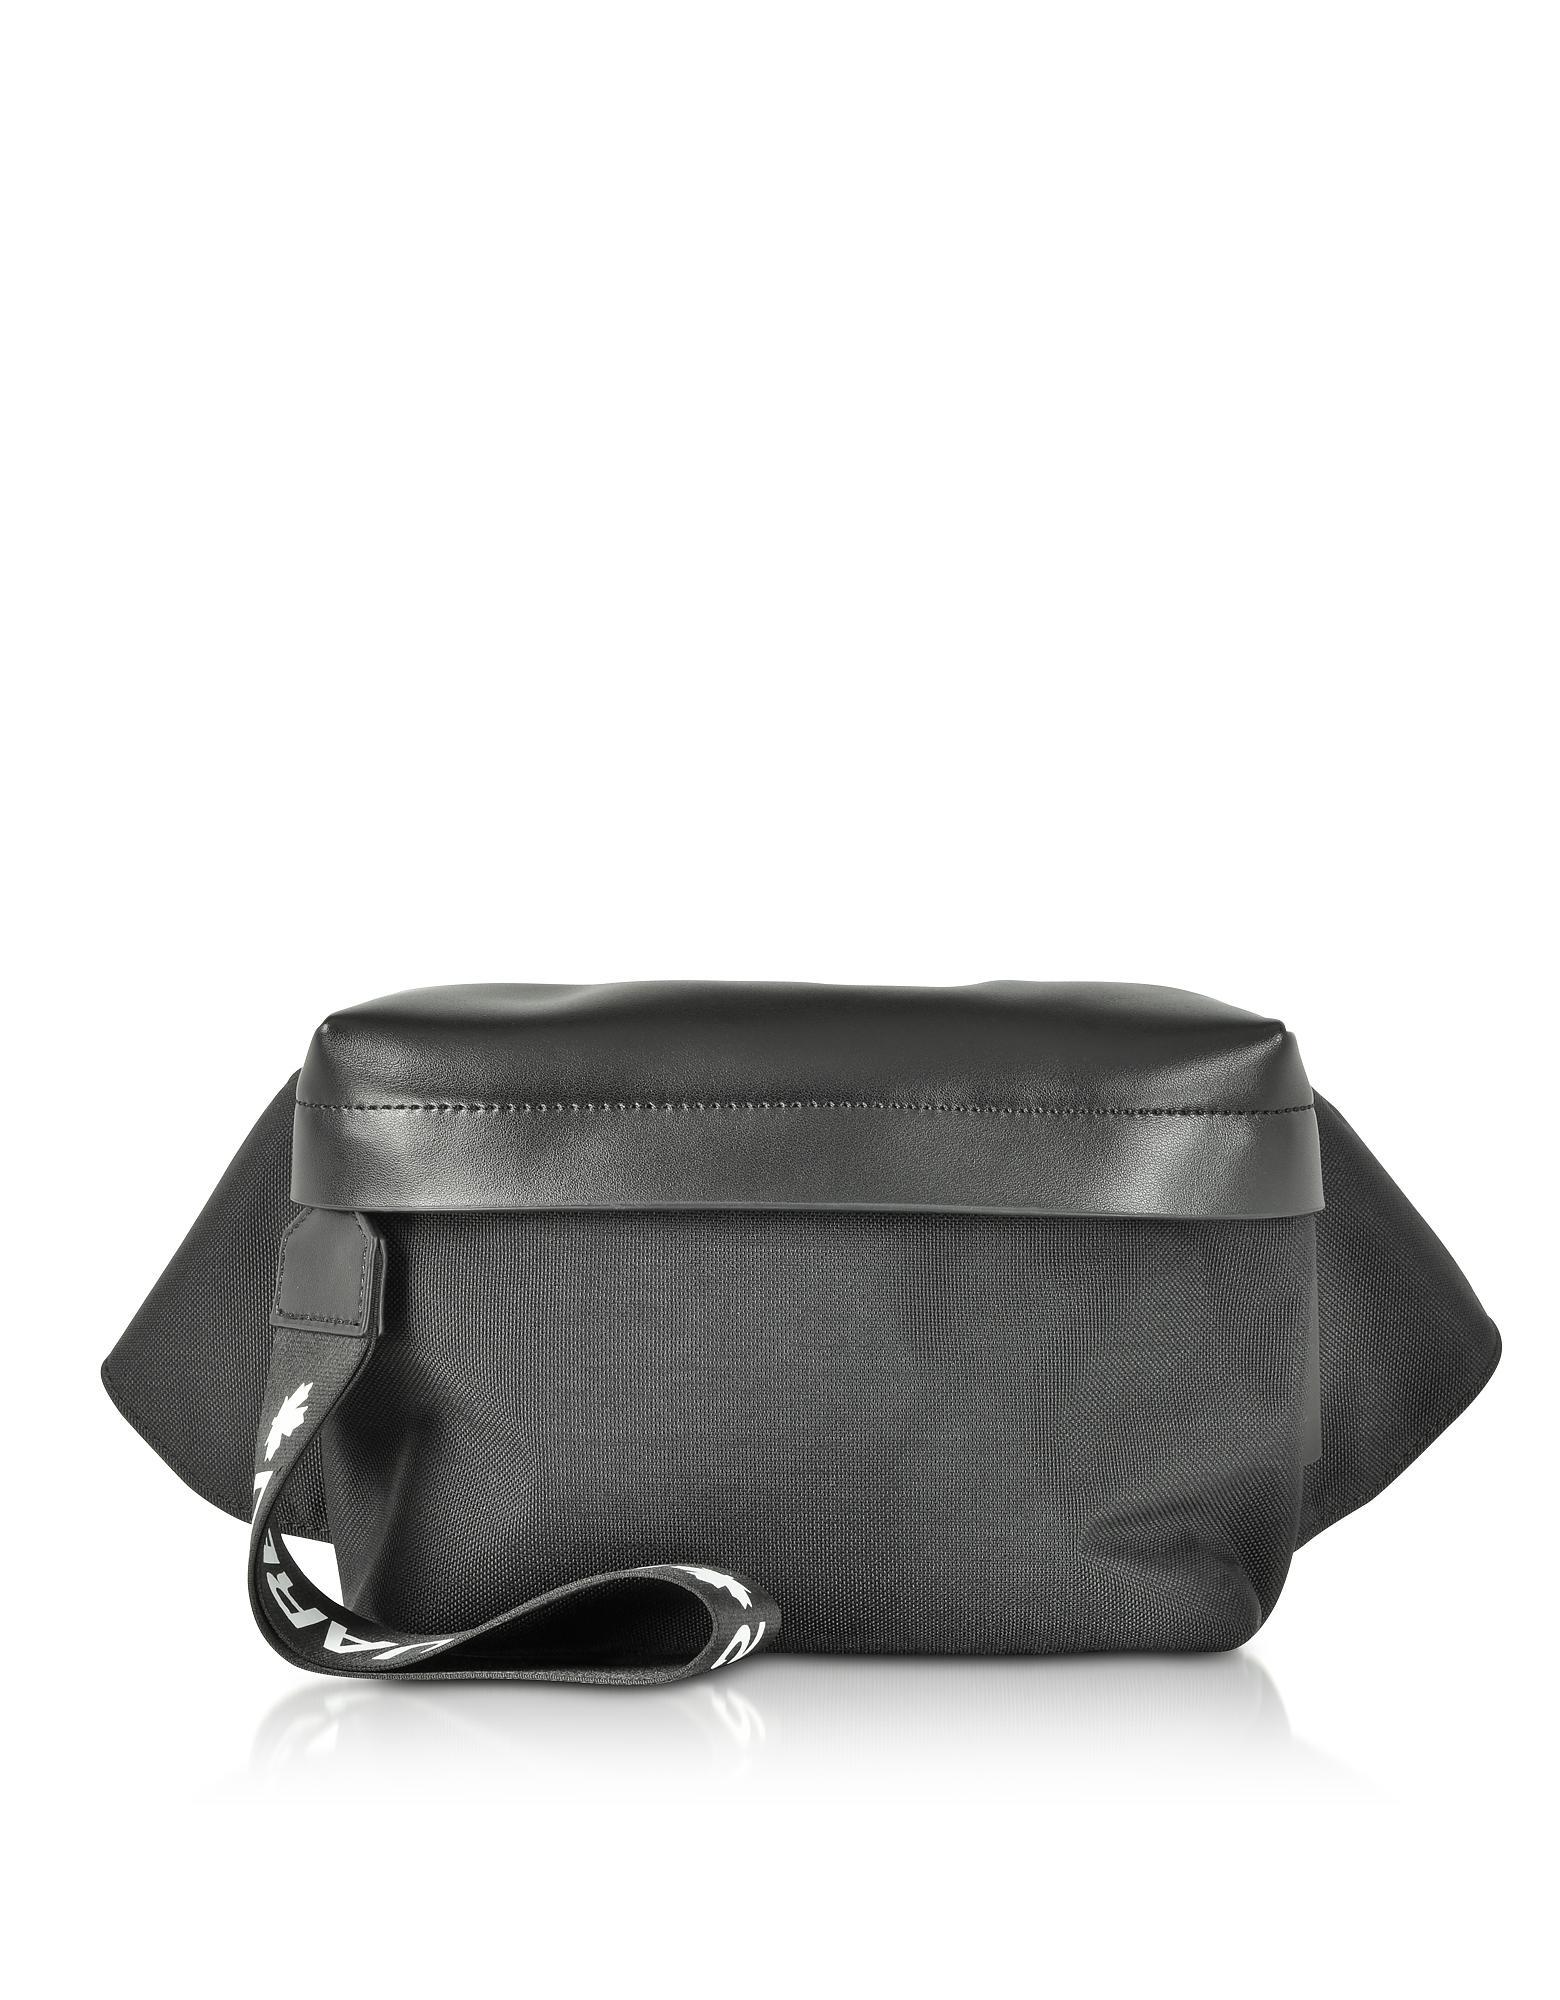 adc649ffa6b7d3 Lyst - DSquared² Black Nylon Bum Bag in Black for Men